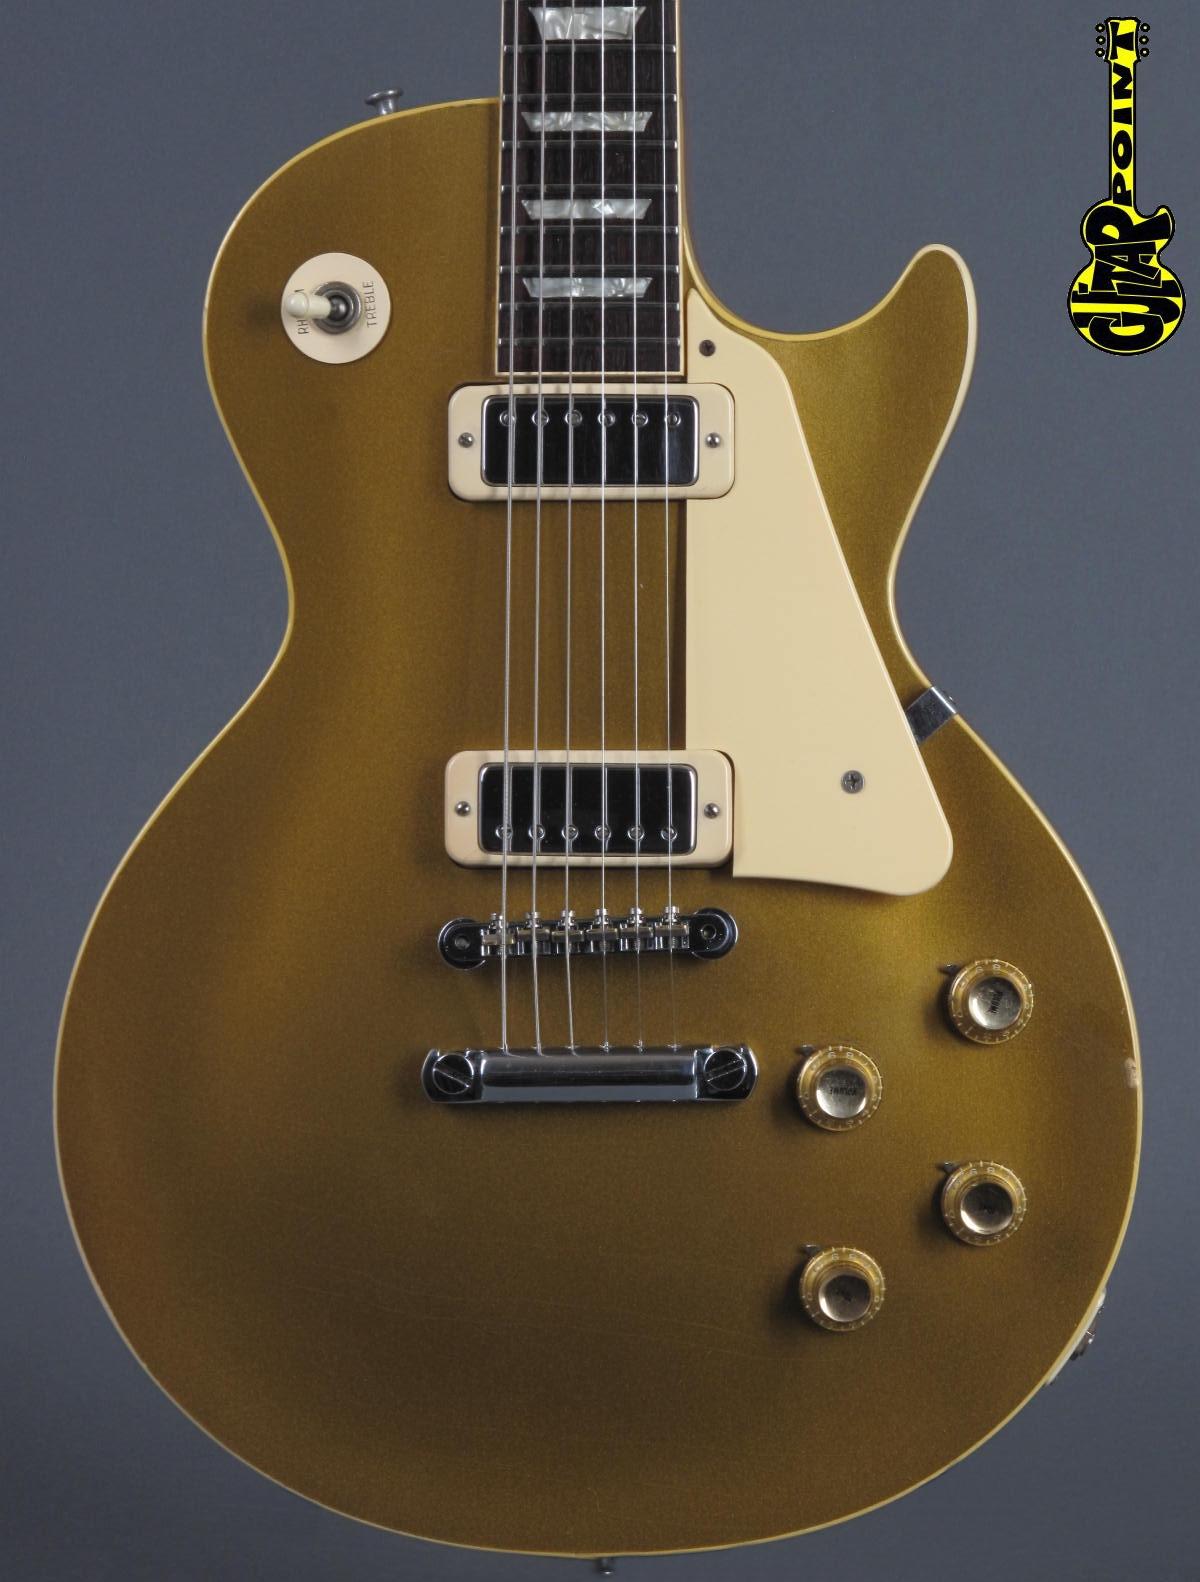 1969 Gibson Les Paul Deluxe - GoldTop   ...lightweight!